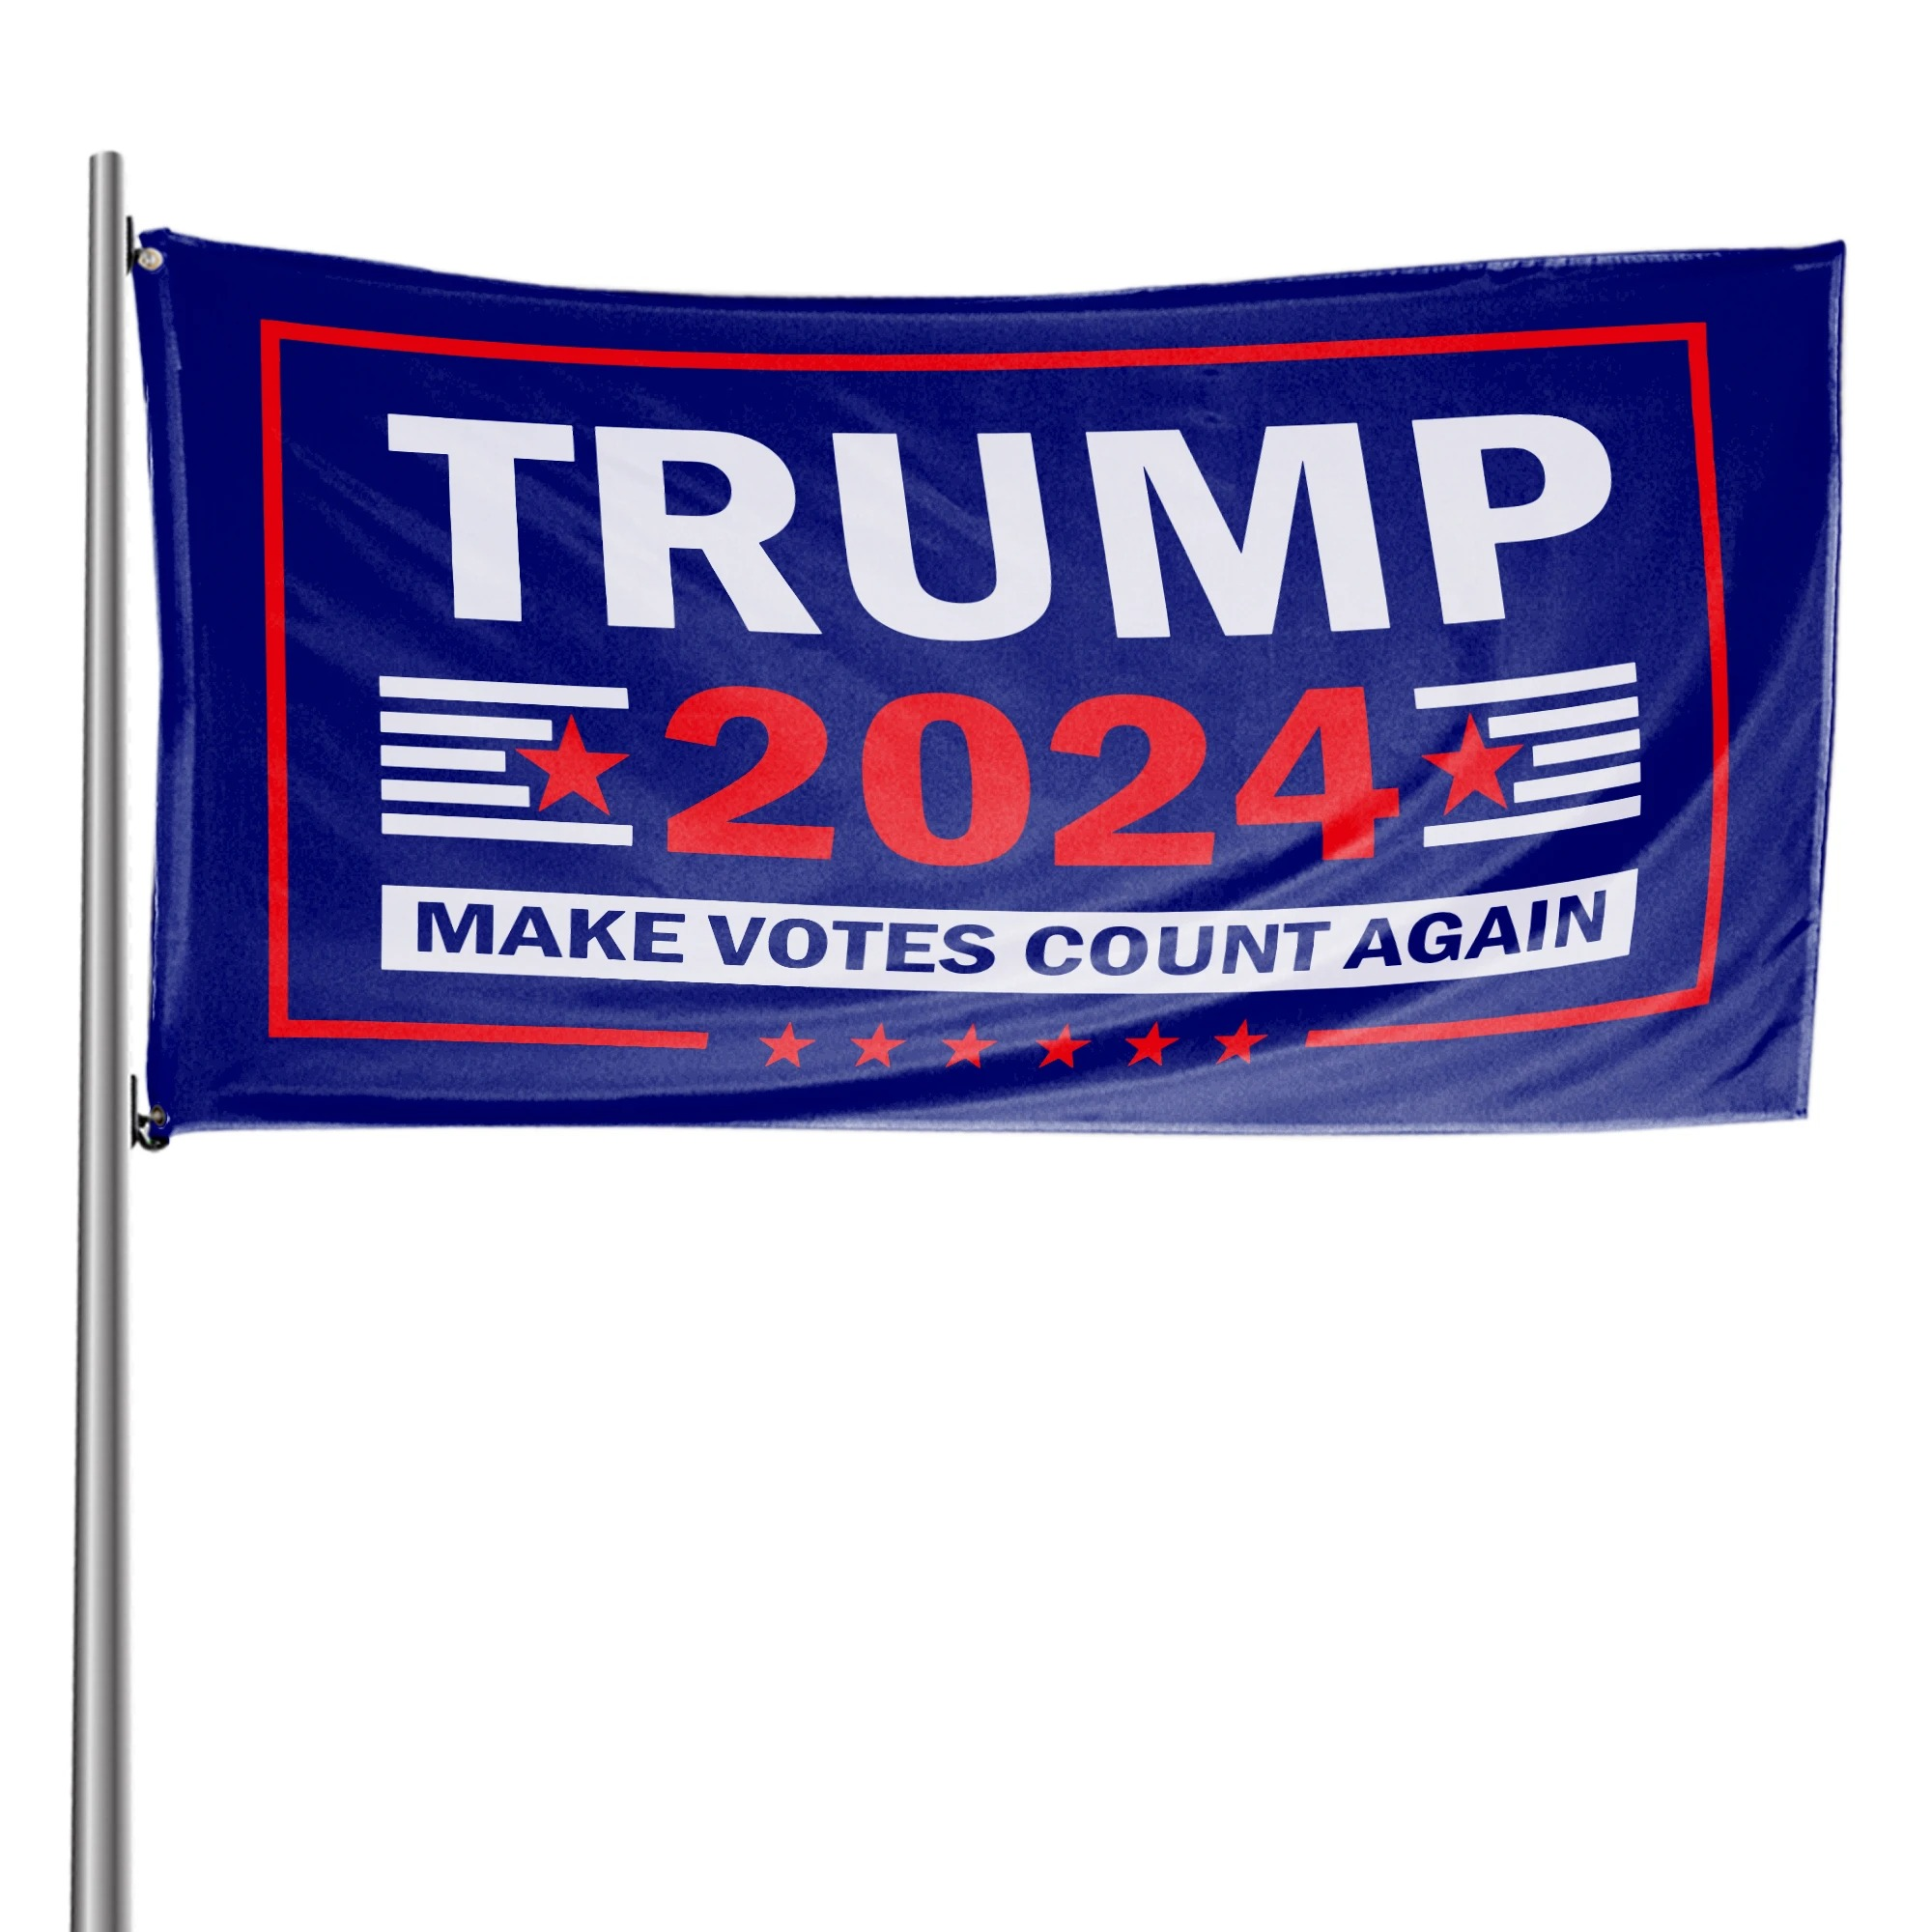 Trump 2024 Make Votes Count Again Flag 2